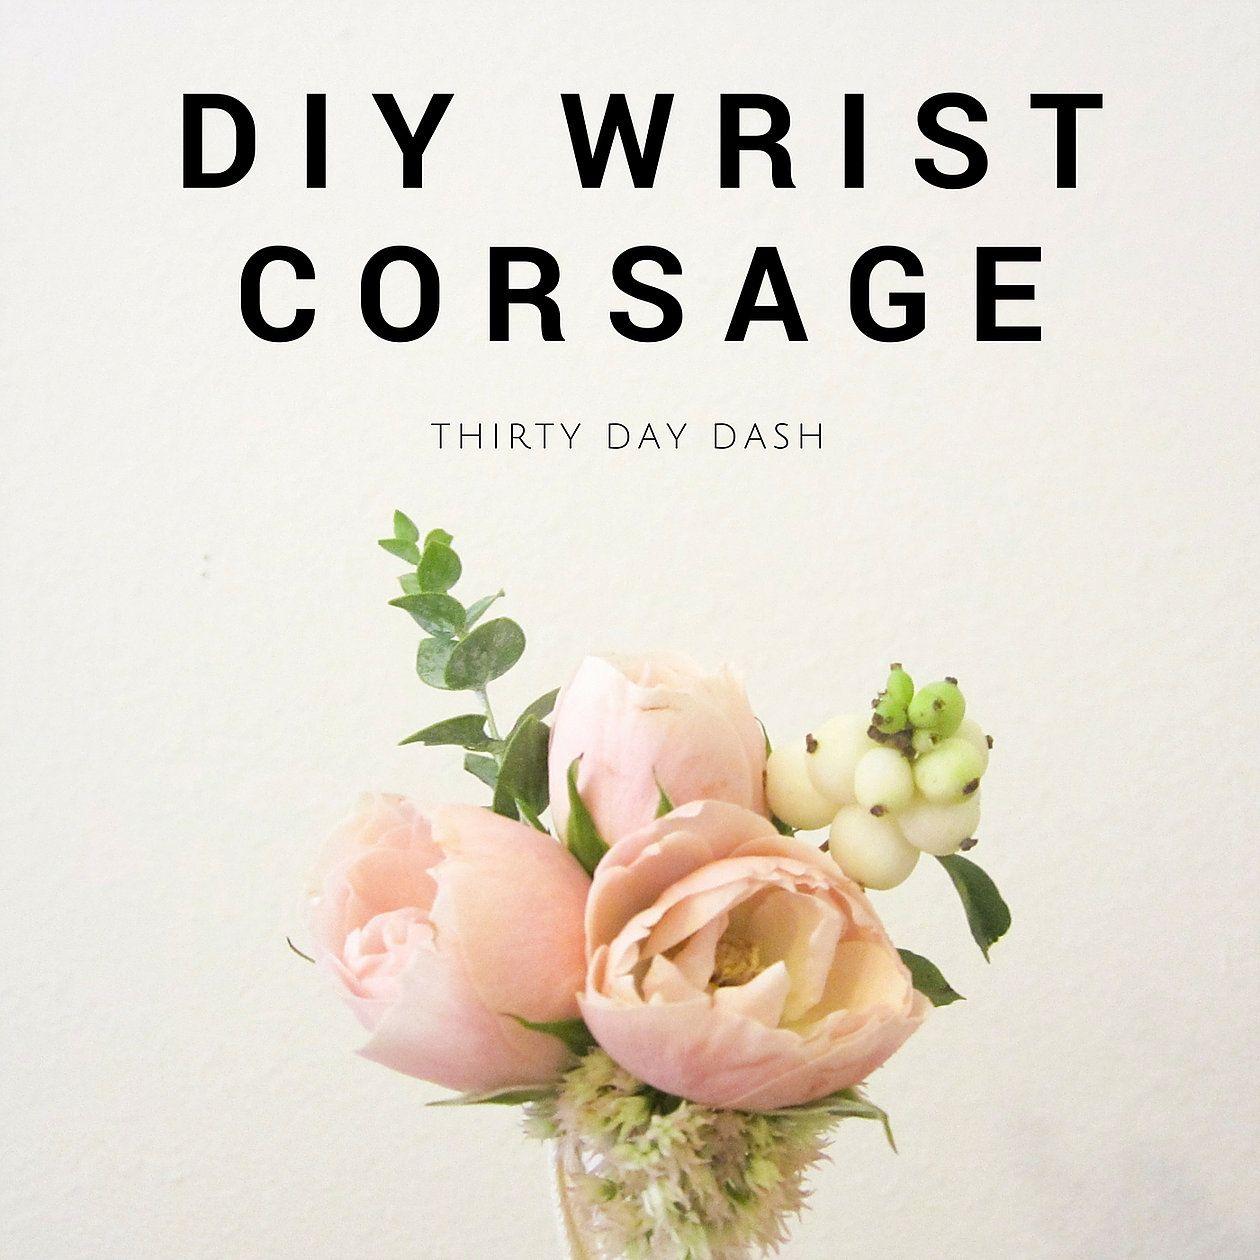 Diy wrist corsage crafts pinterest corsage floral supplies